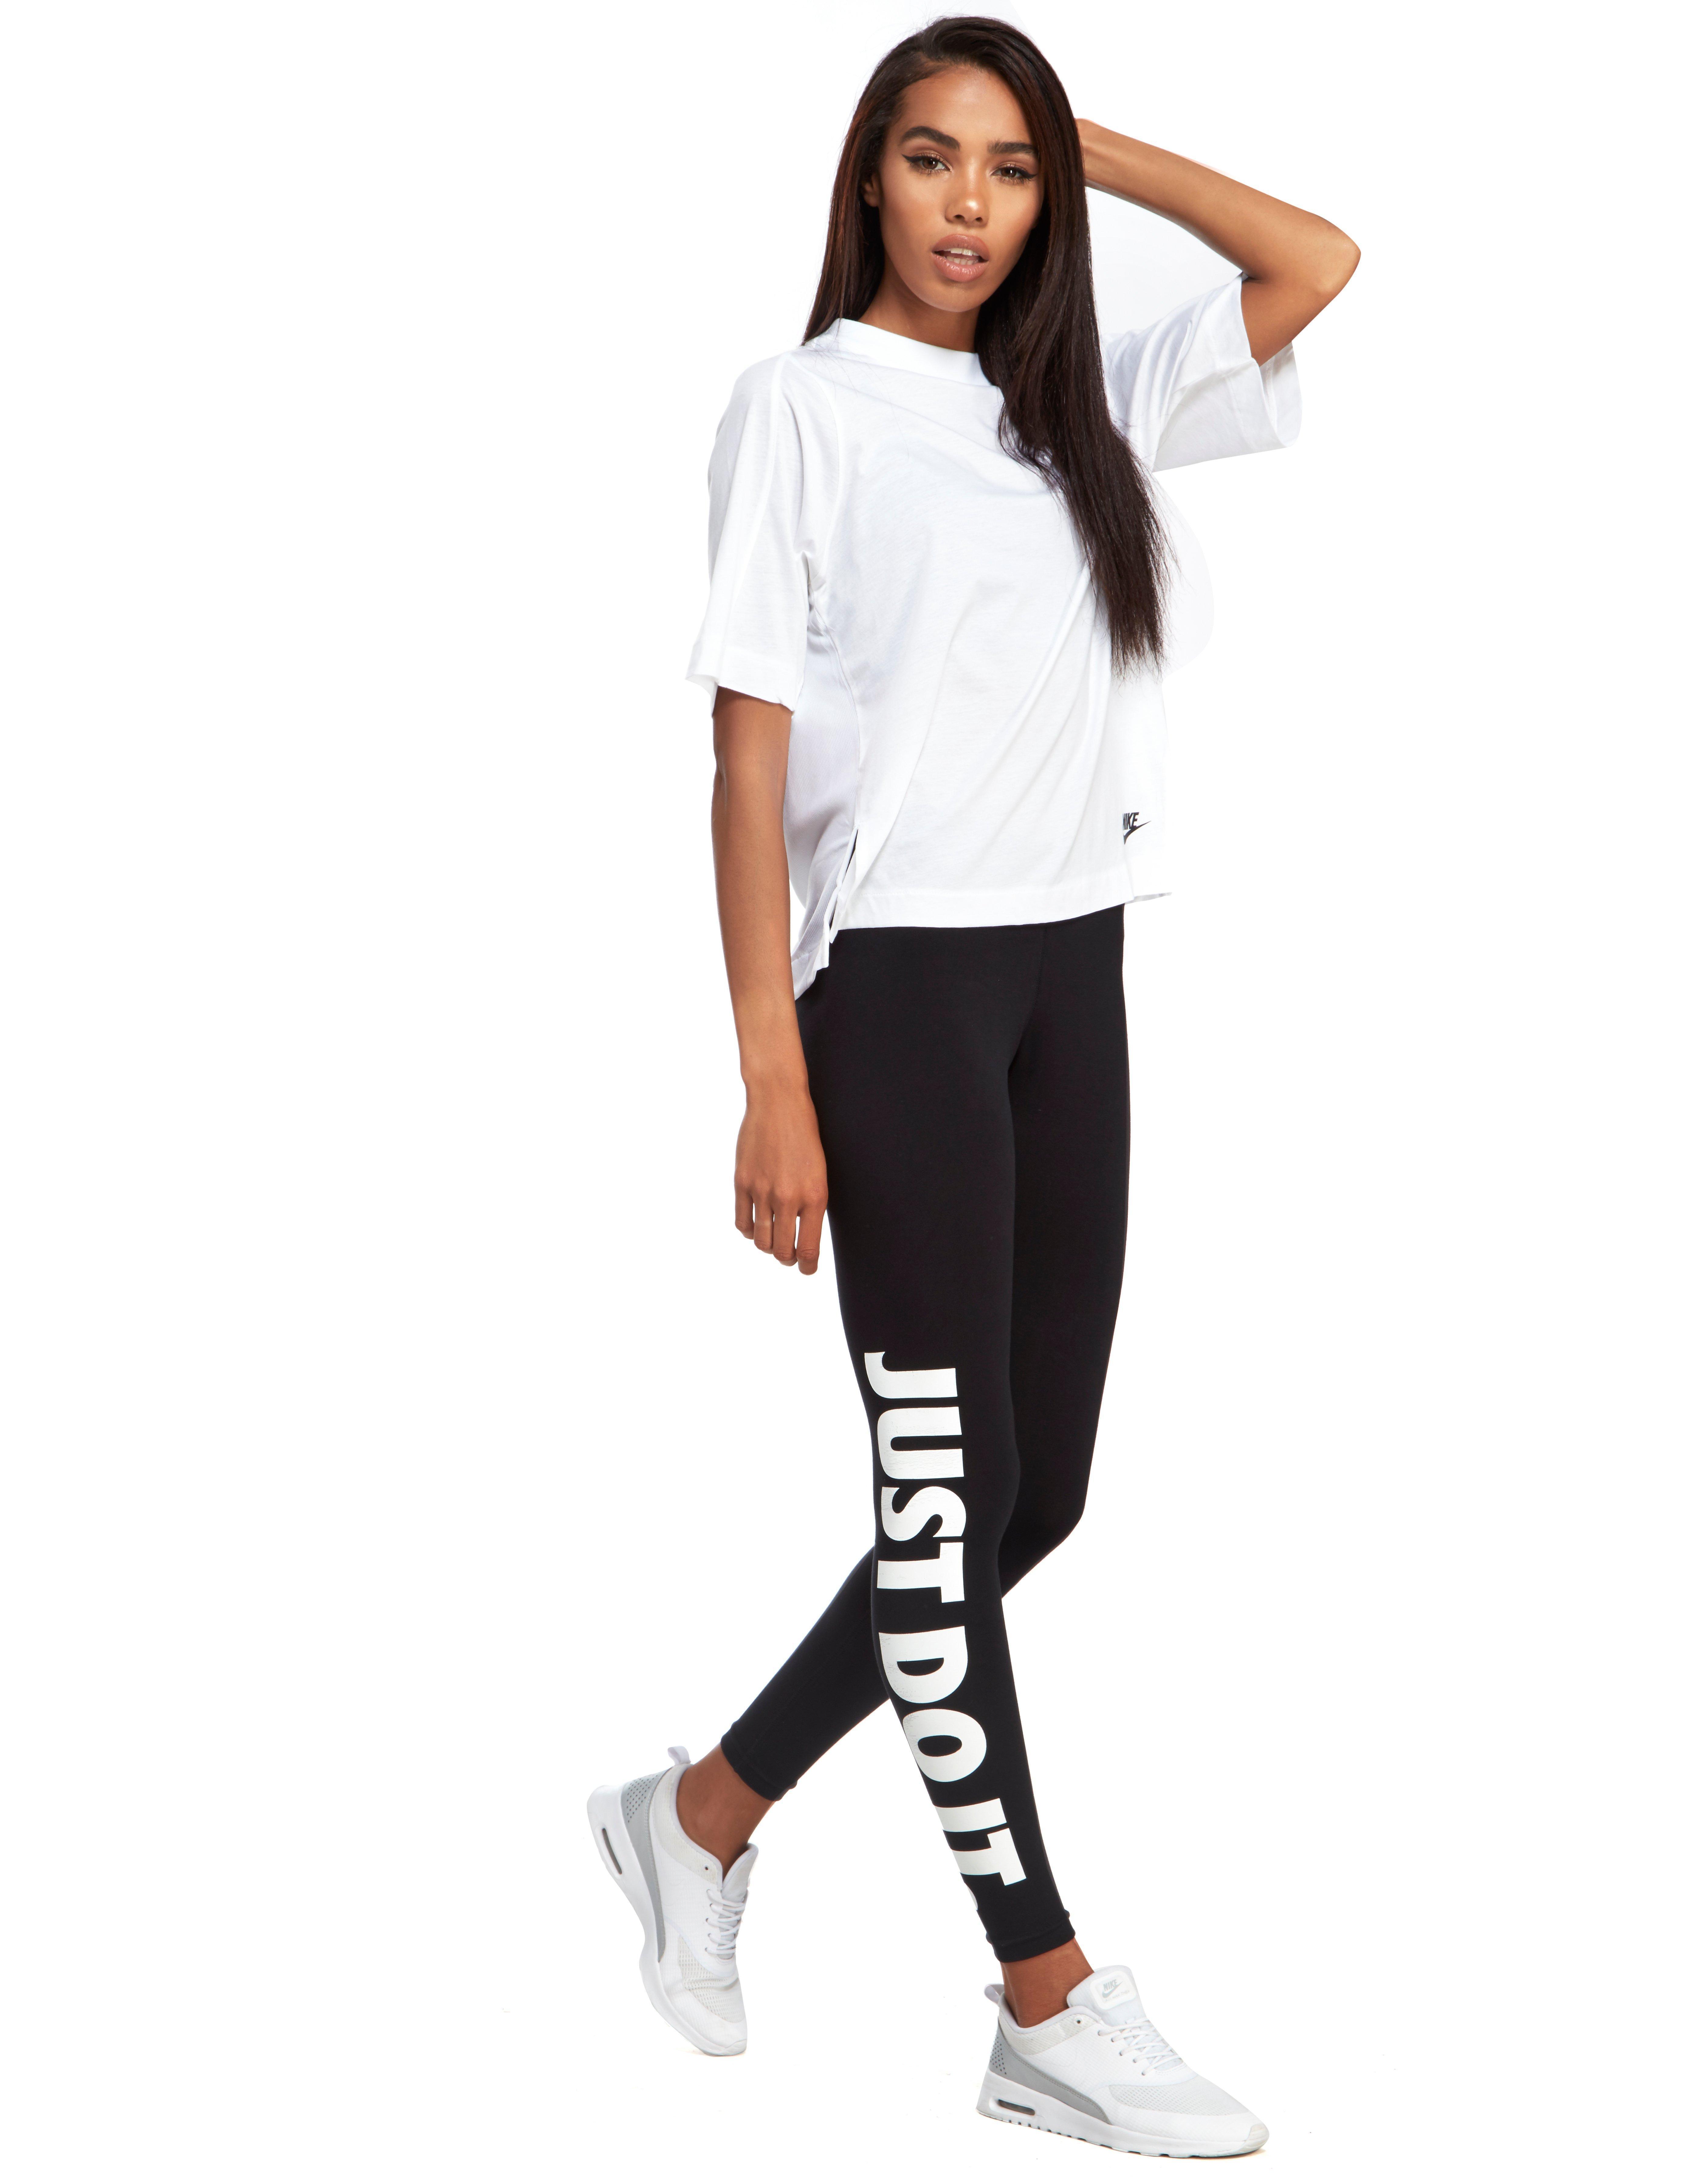 48a8d82bf3e965 Nike Sportswear Bonded Top in White - Lyst